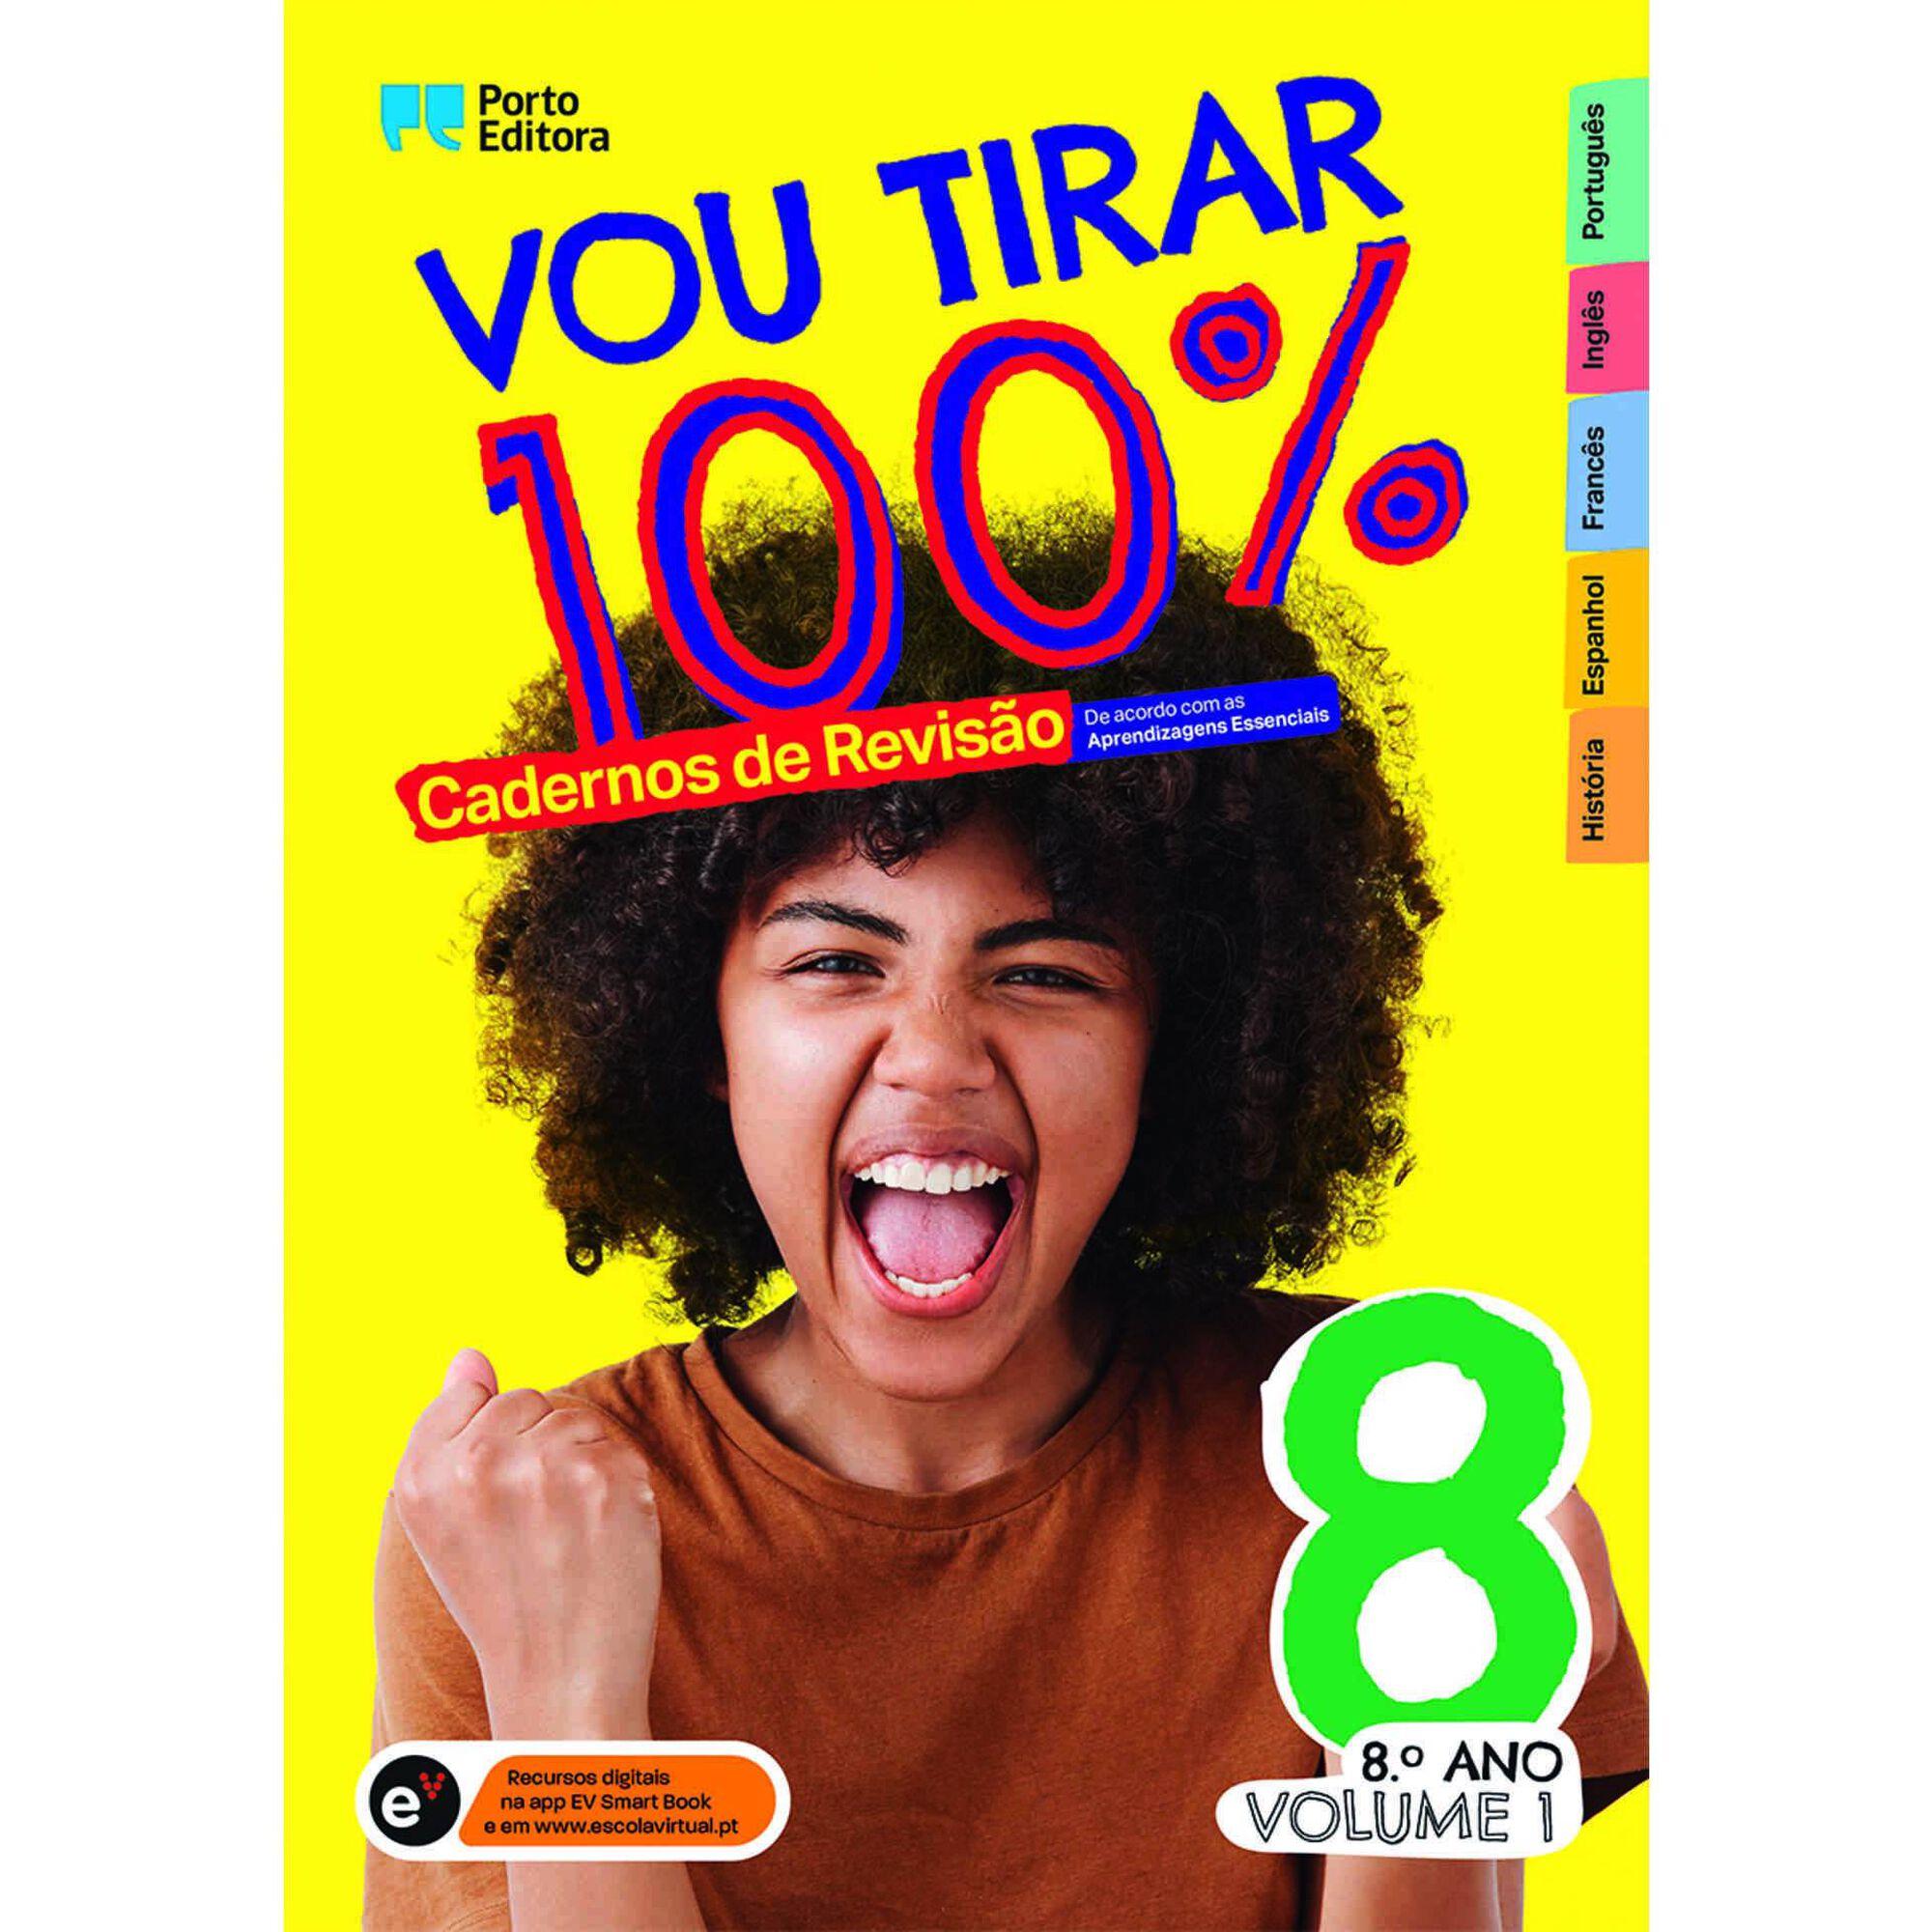 Vou Tirar 100% - 8º Ano (volume 1)